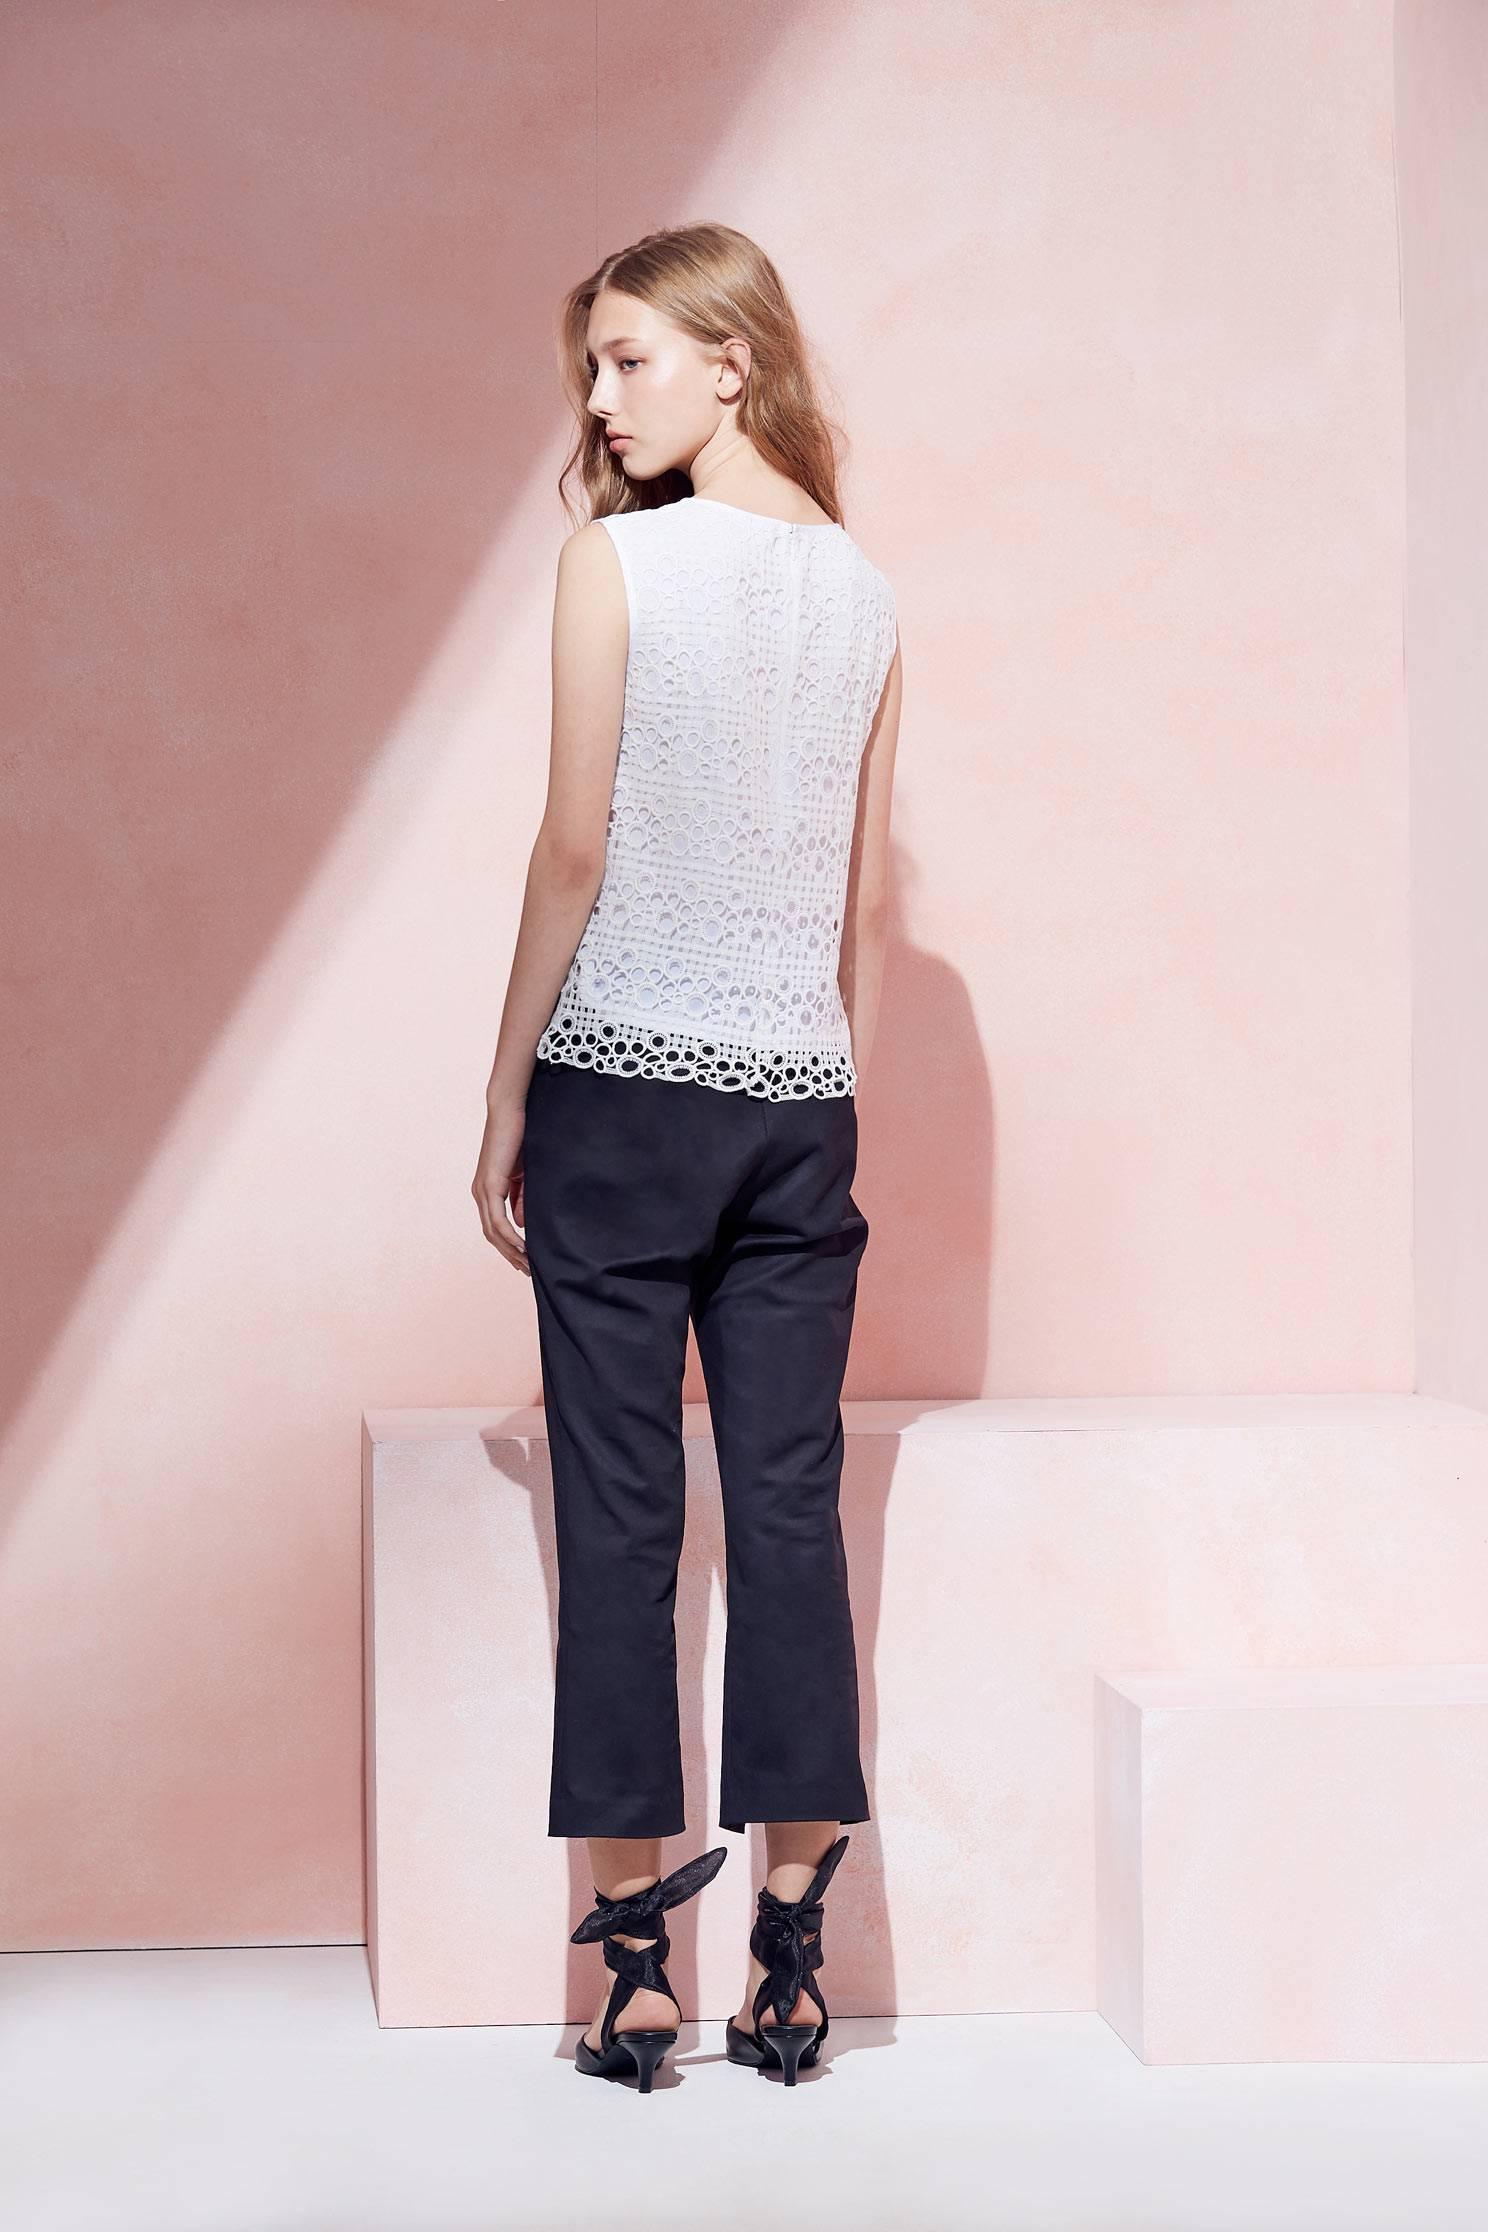 Elegant fashion vest,Singlet,Fire Signs,白色背心,Valentine,vest,Girlfriends spring tour